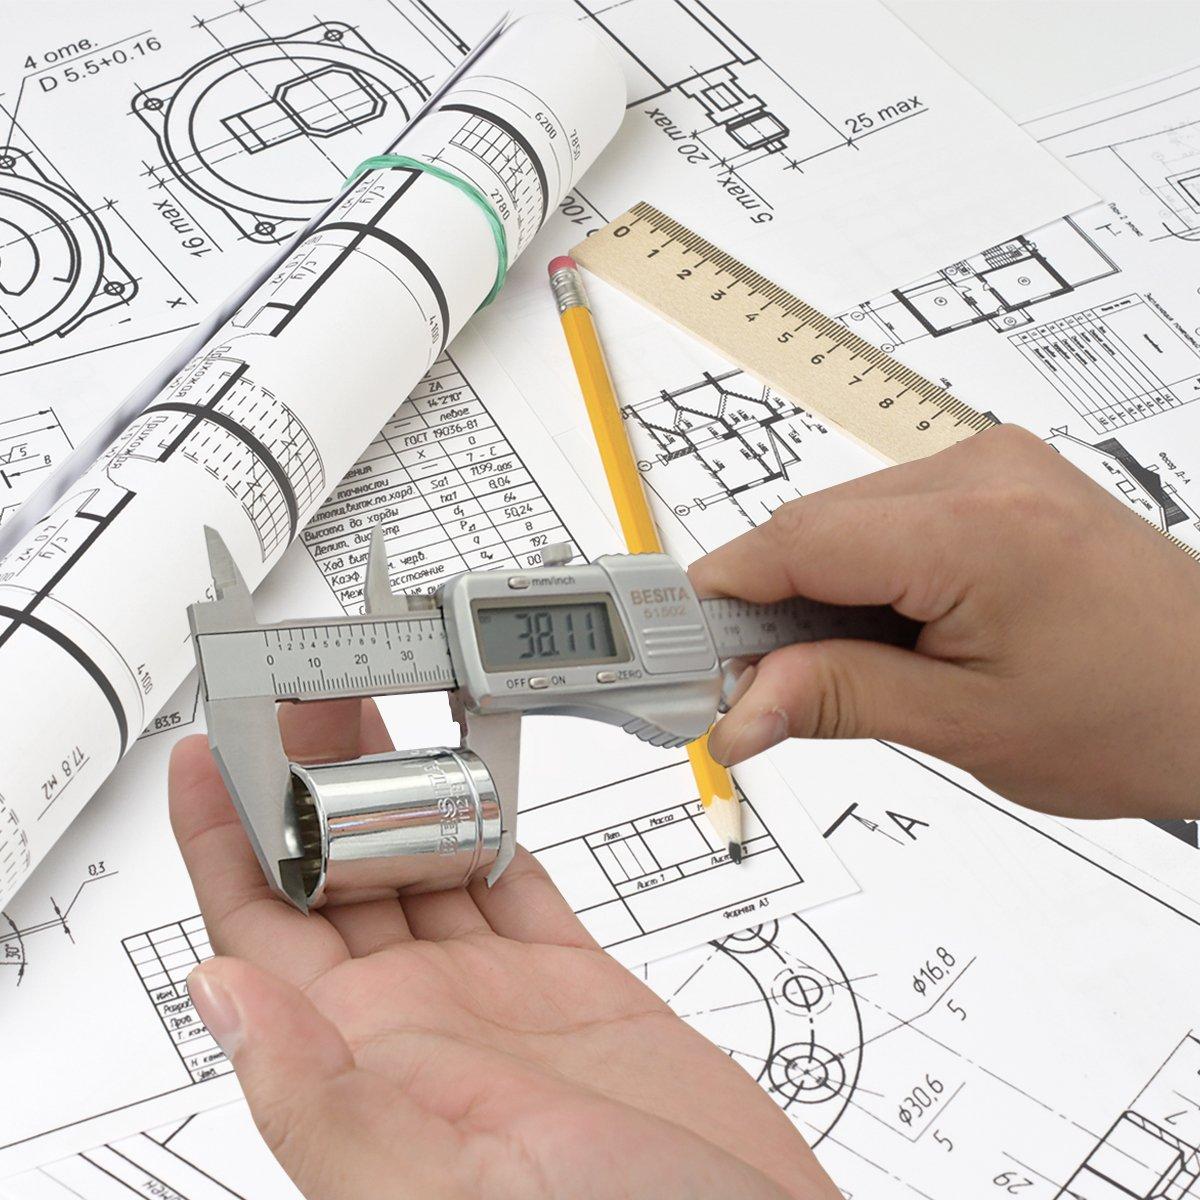 Digital Caliper with Accurate Measurement Inch/Metric ,0-6 Inch/150 mm BESITA Stainless Steel Vernier Caliper IP54 Waterproof Electronic Measuring Tool by BESITA (Image #5)